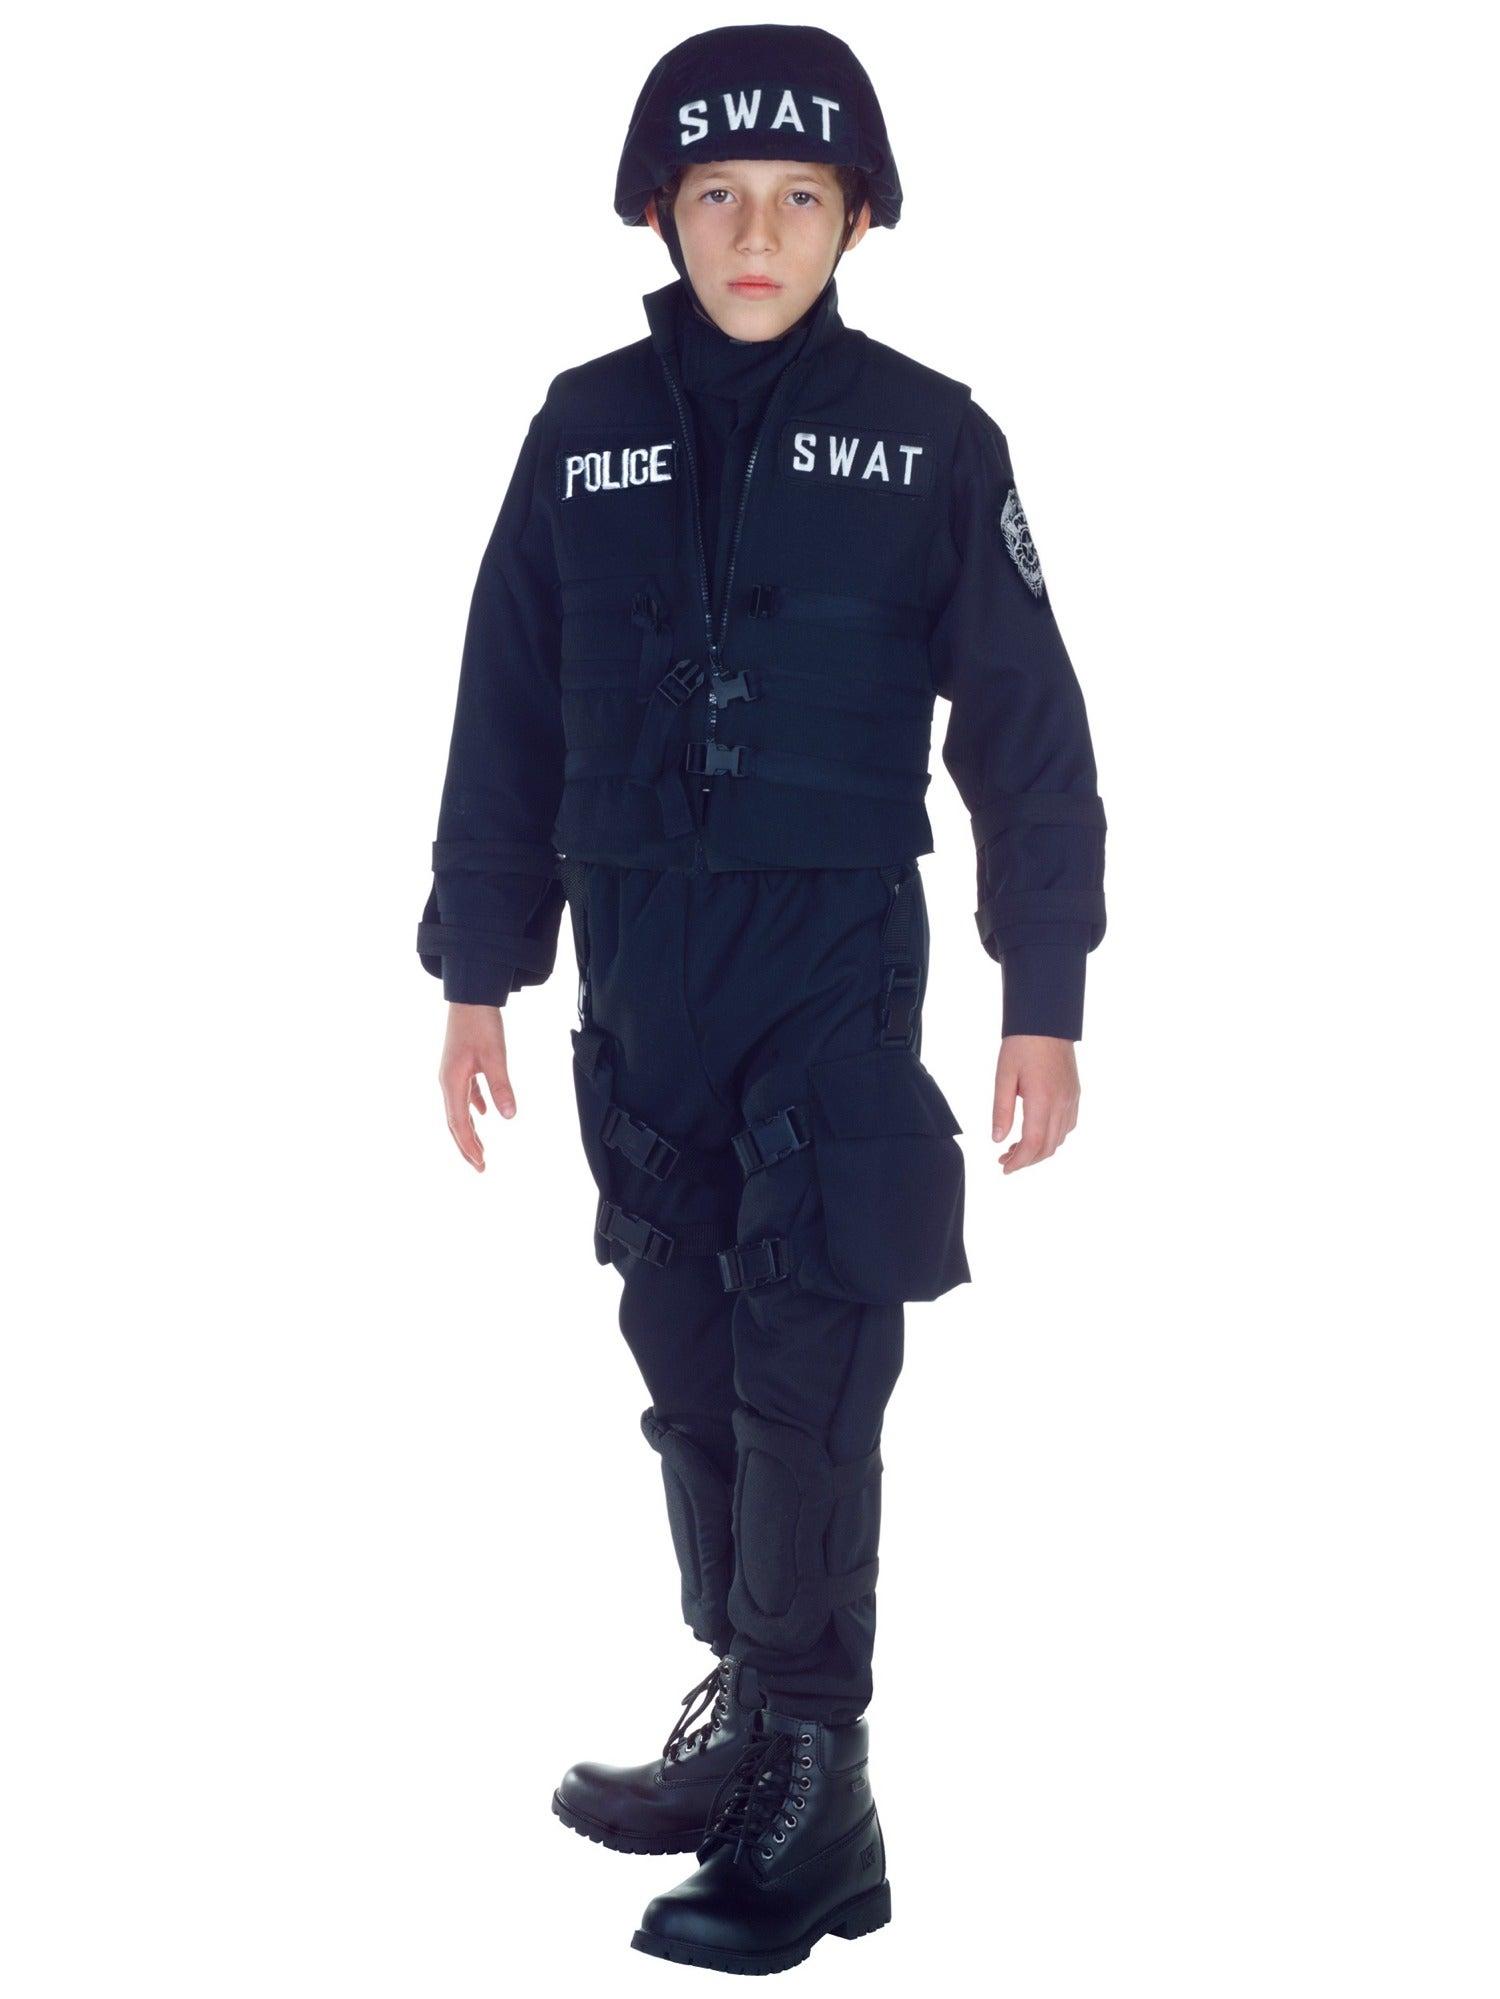 Hobbypos SWAT S.W.A.T. Military Police Cop Commander FBI Book Week Boys Costume